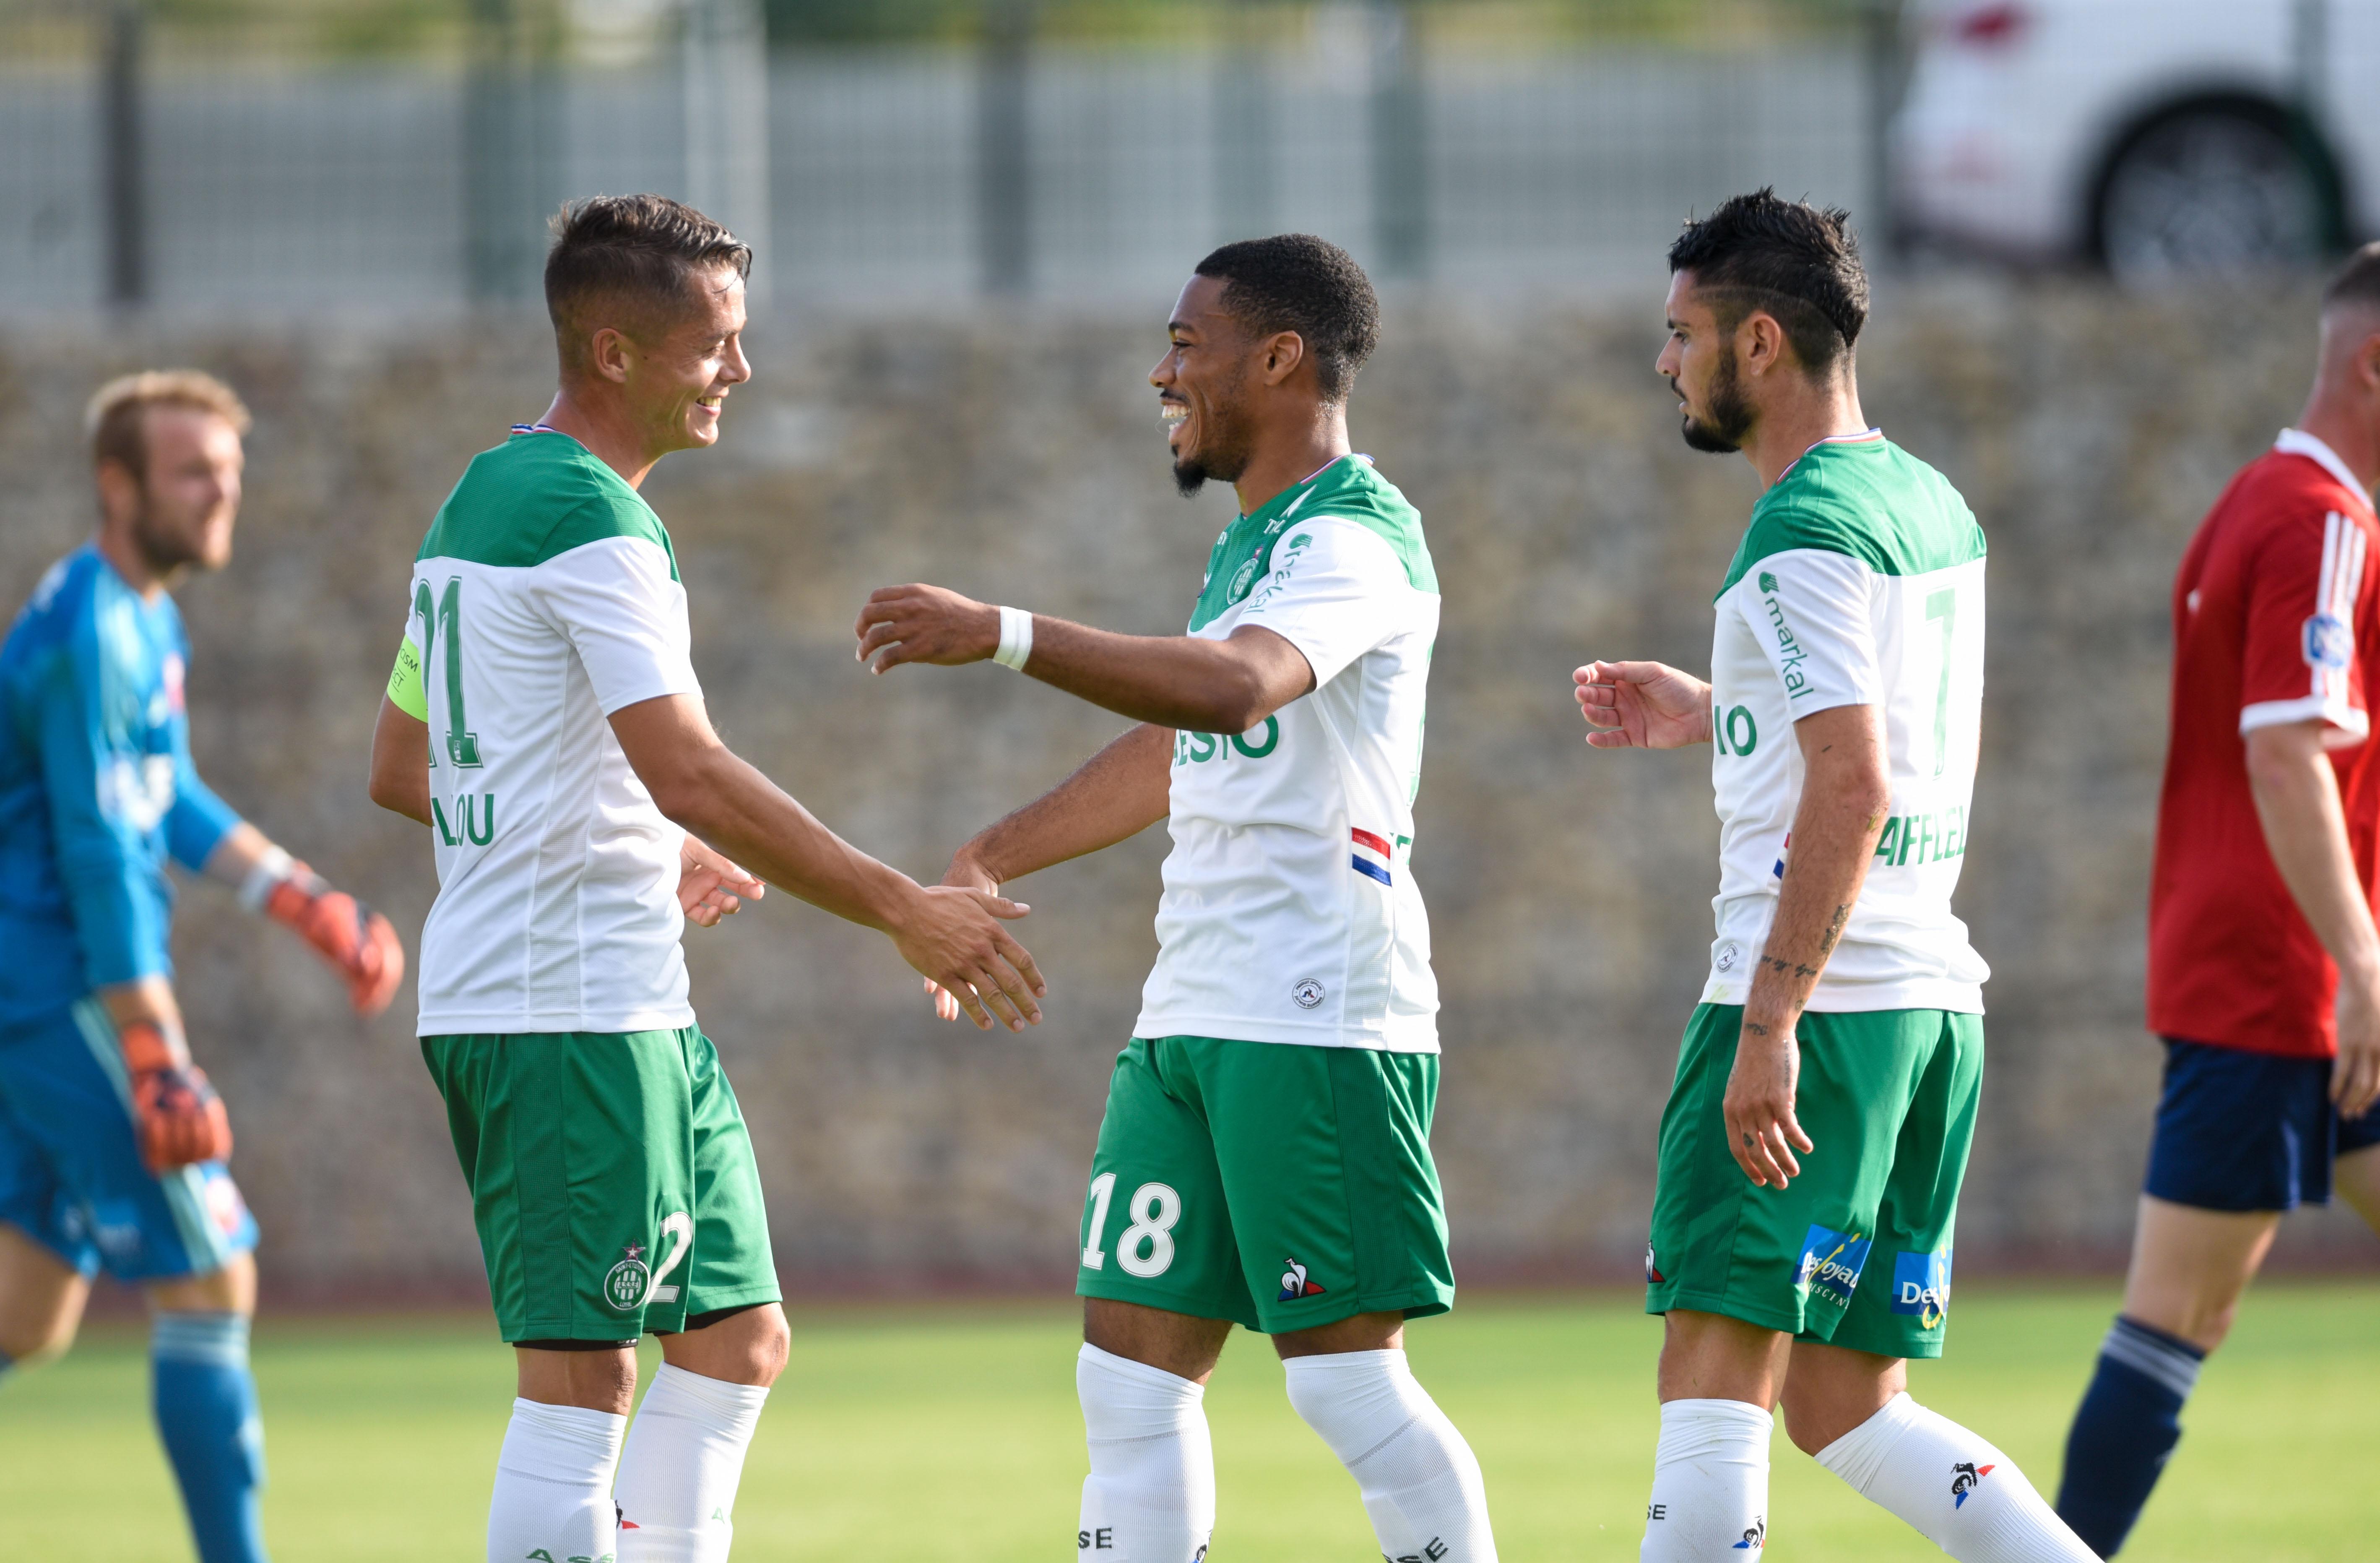 Football - Ligue 1 - L'été américain et serein des Verts